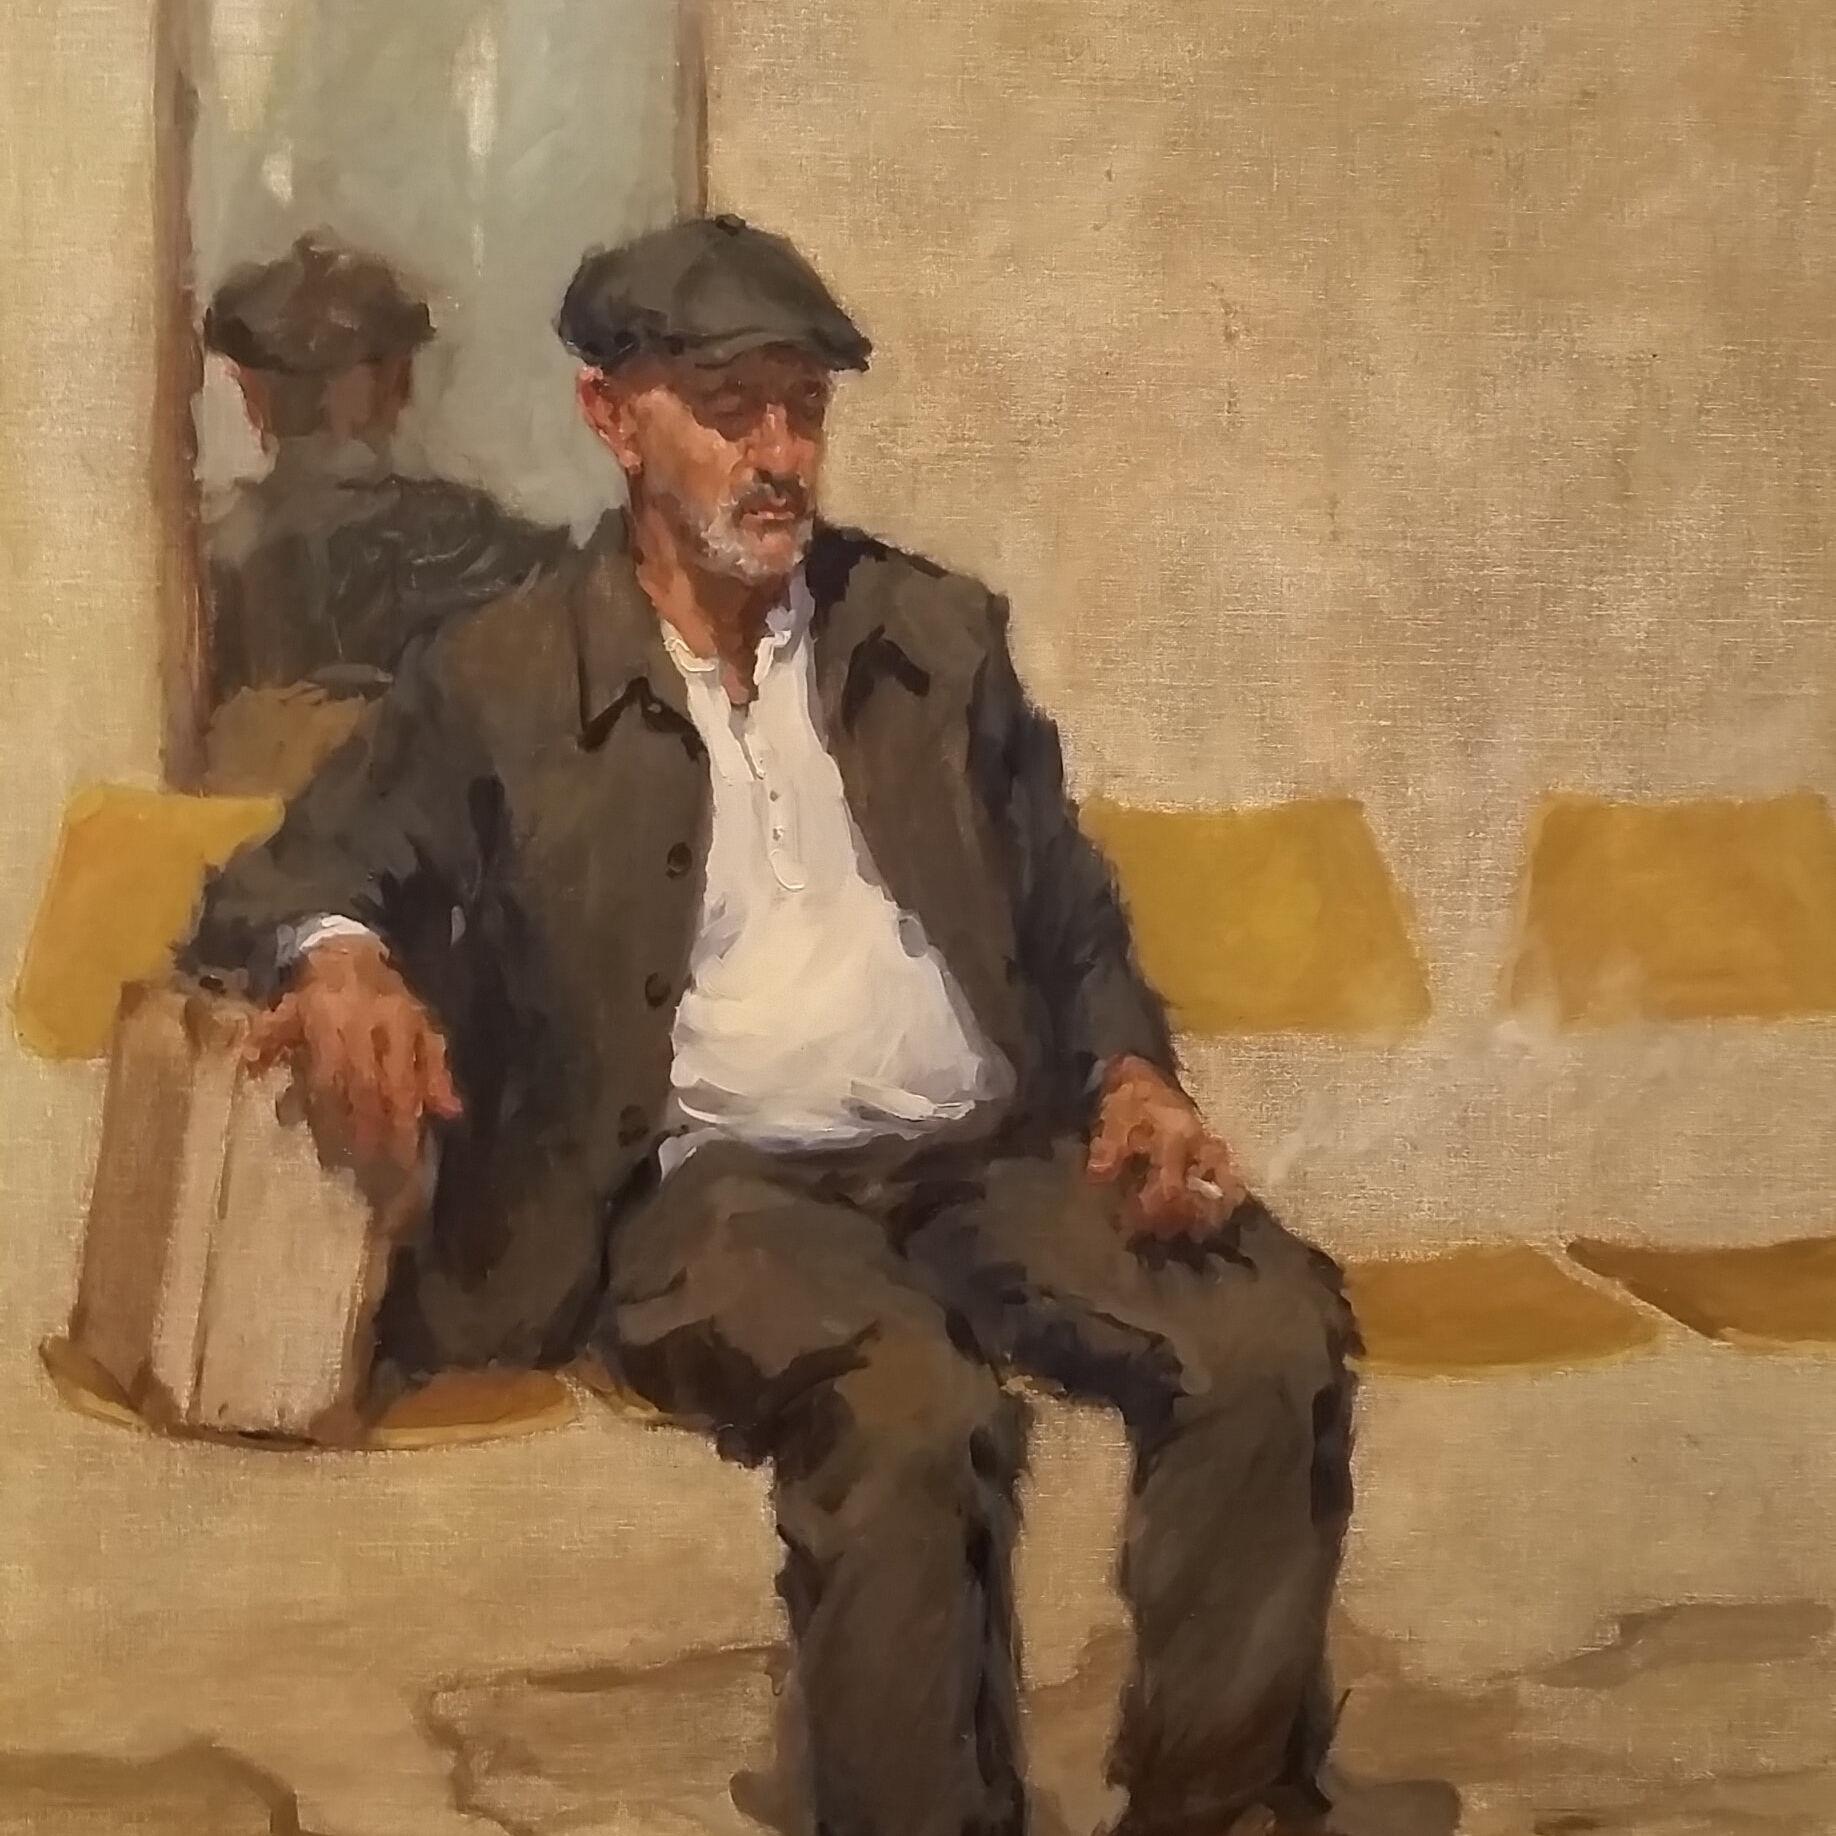 Jen Fyfe VAS—Biglietto Per Uno—Life Portrait Sketch, Oil on Linen, $2800_highly commended 2021